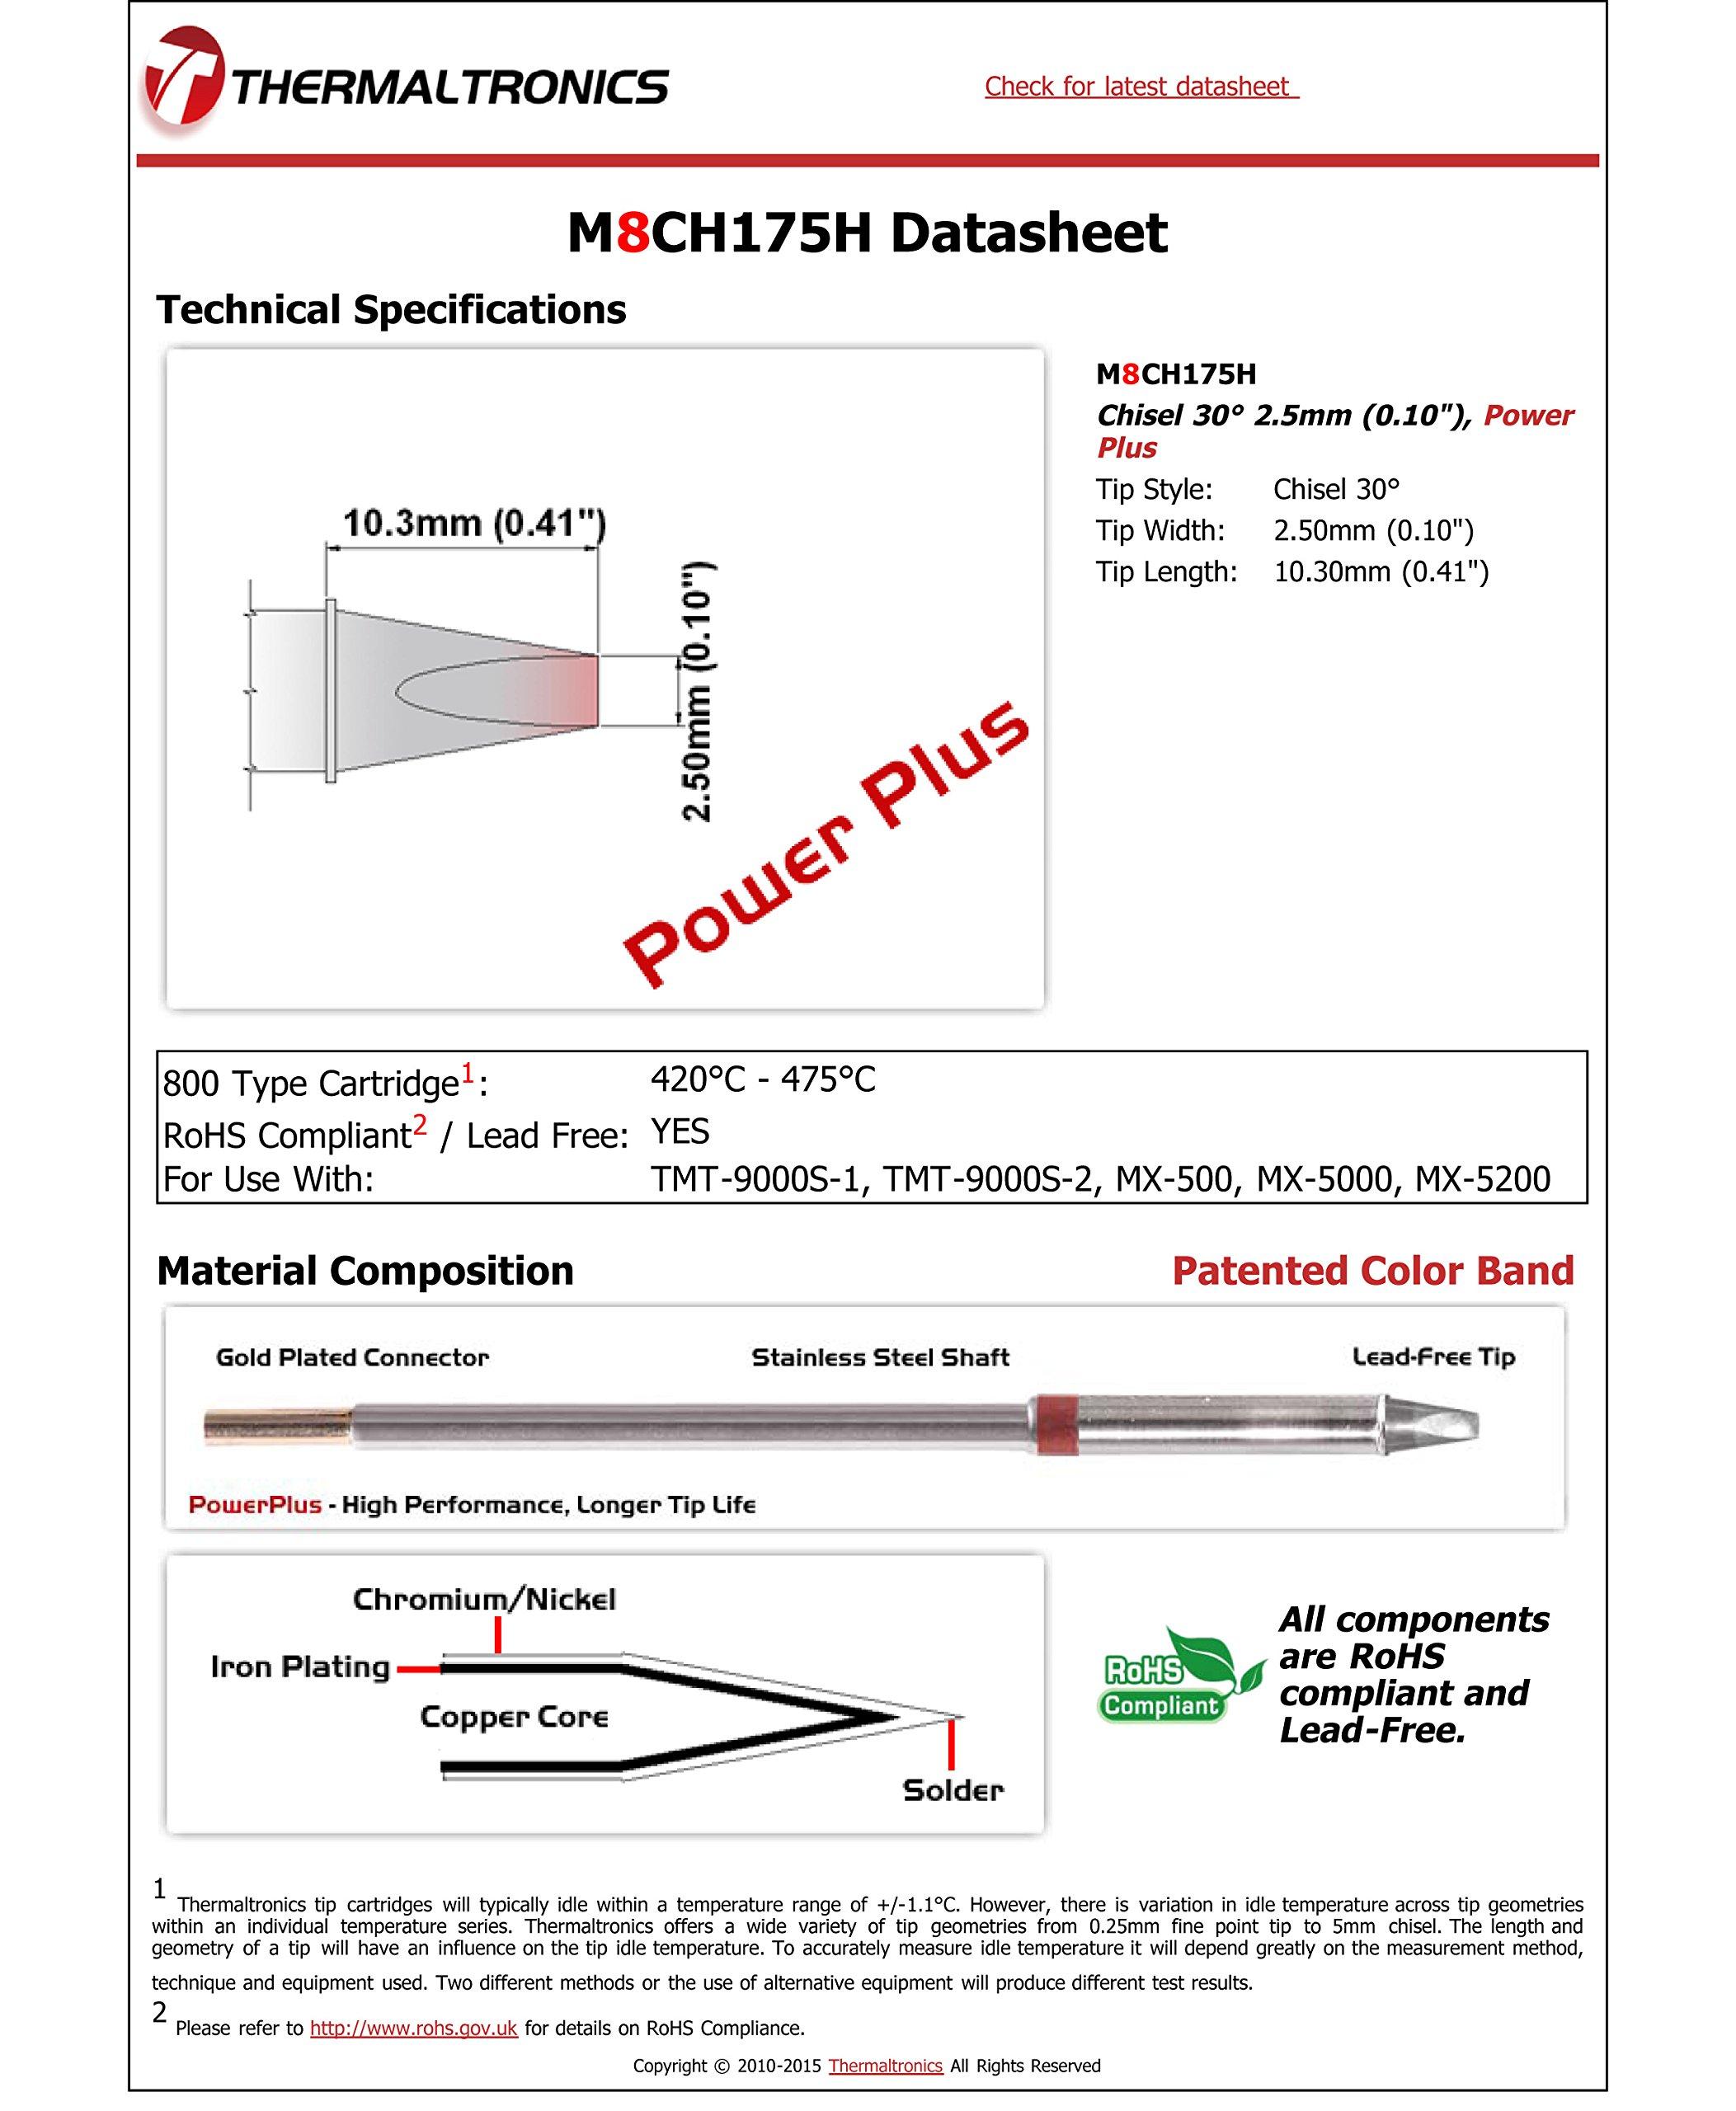 Thermaltronics M8CH175H Chisel 30deg 2.5mm (0.10''), Power Plus